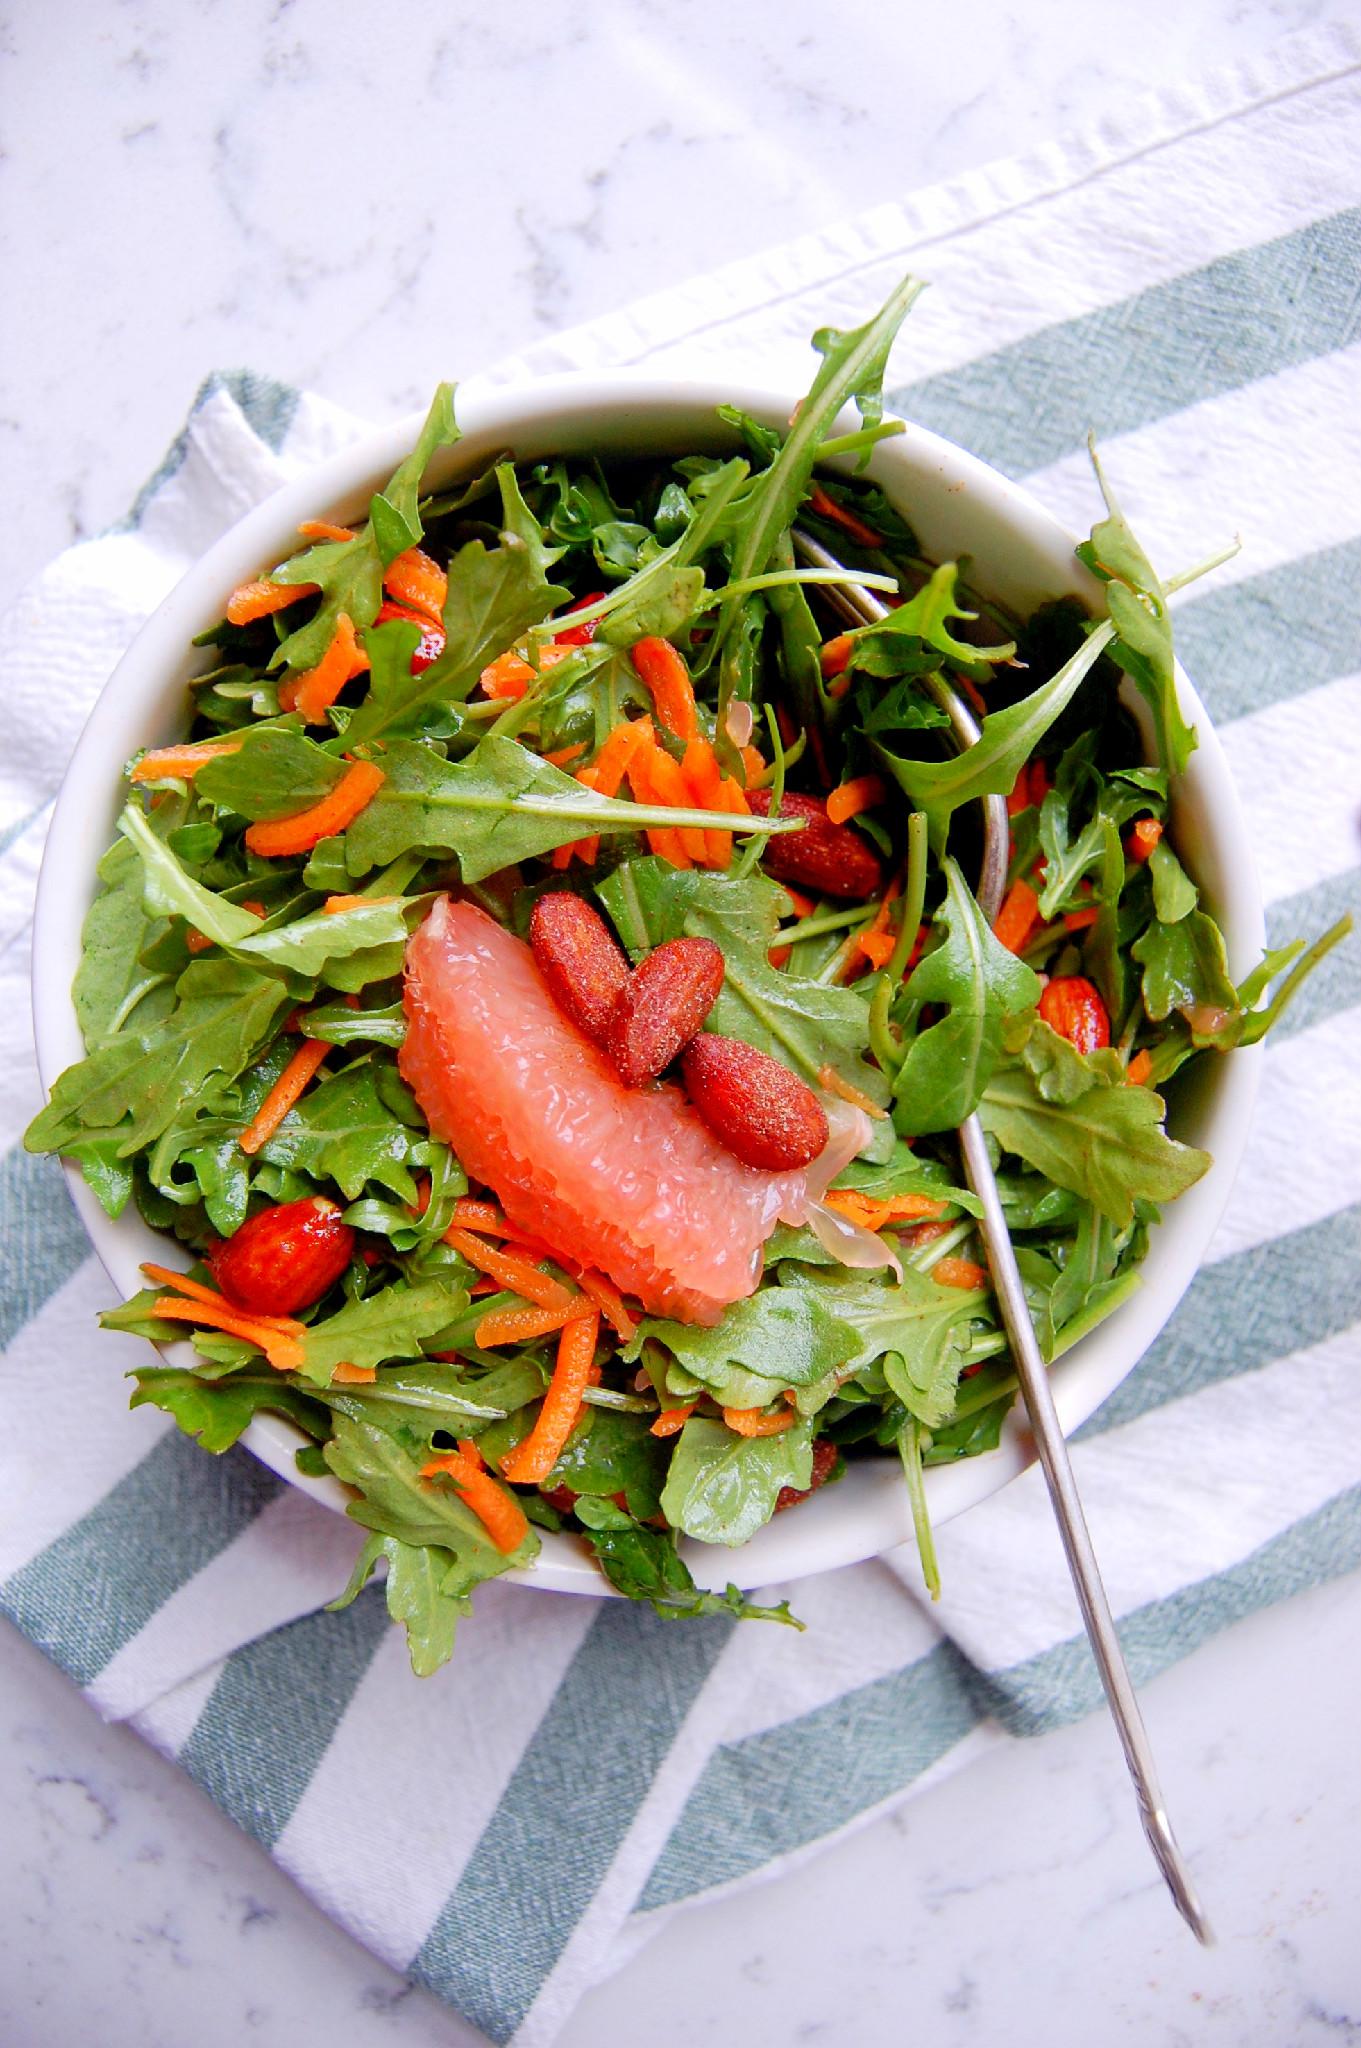 Delicate and delicious arugula salad 70